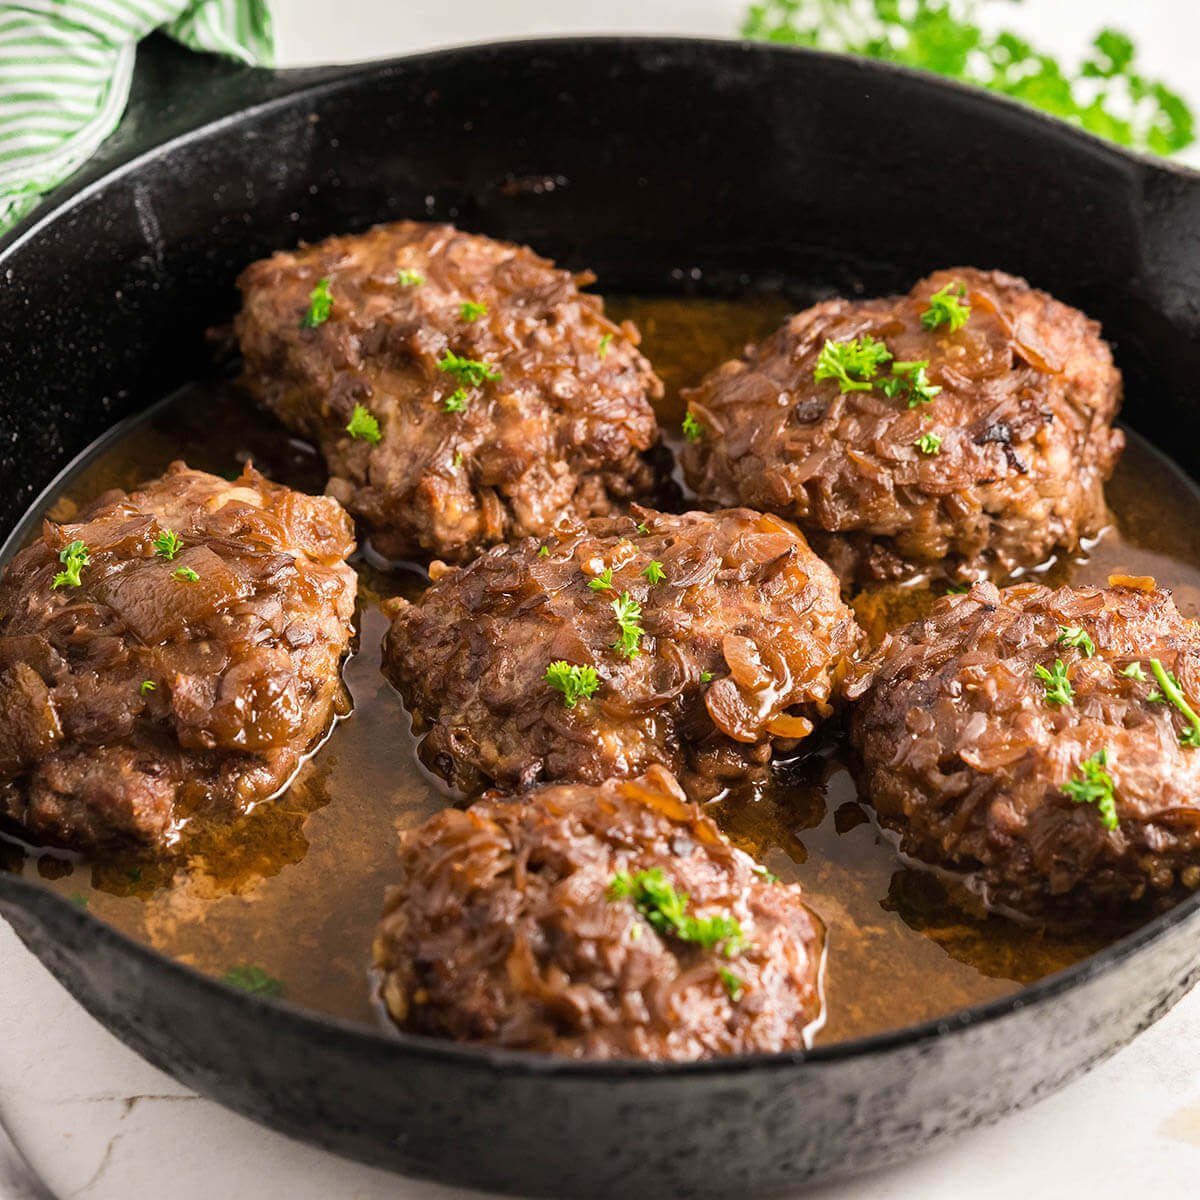 Cast Iron Skillet filled with Salisbury steak with onion gravy.